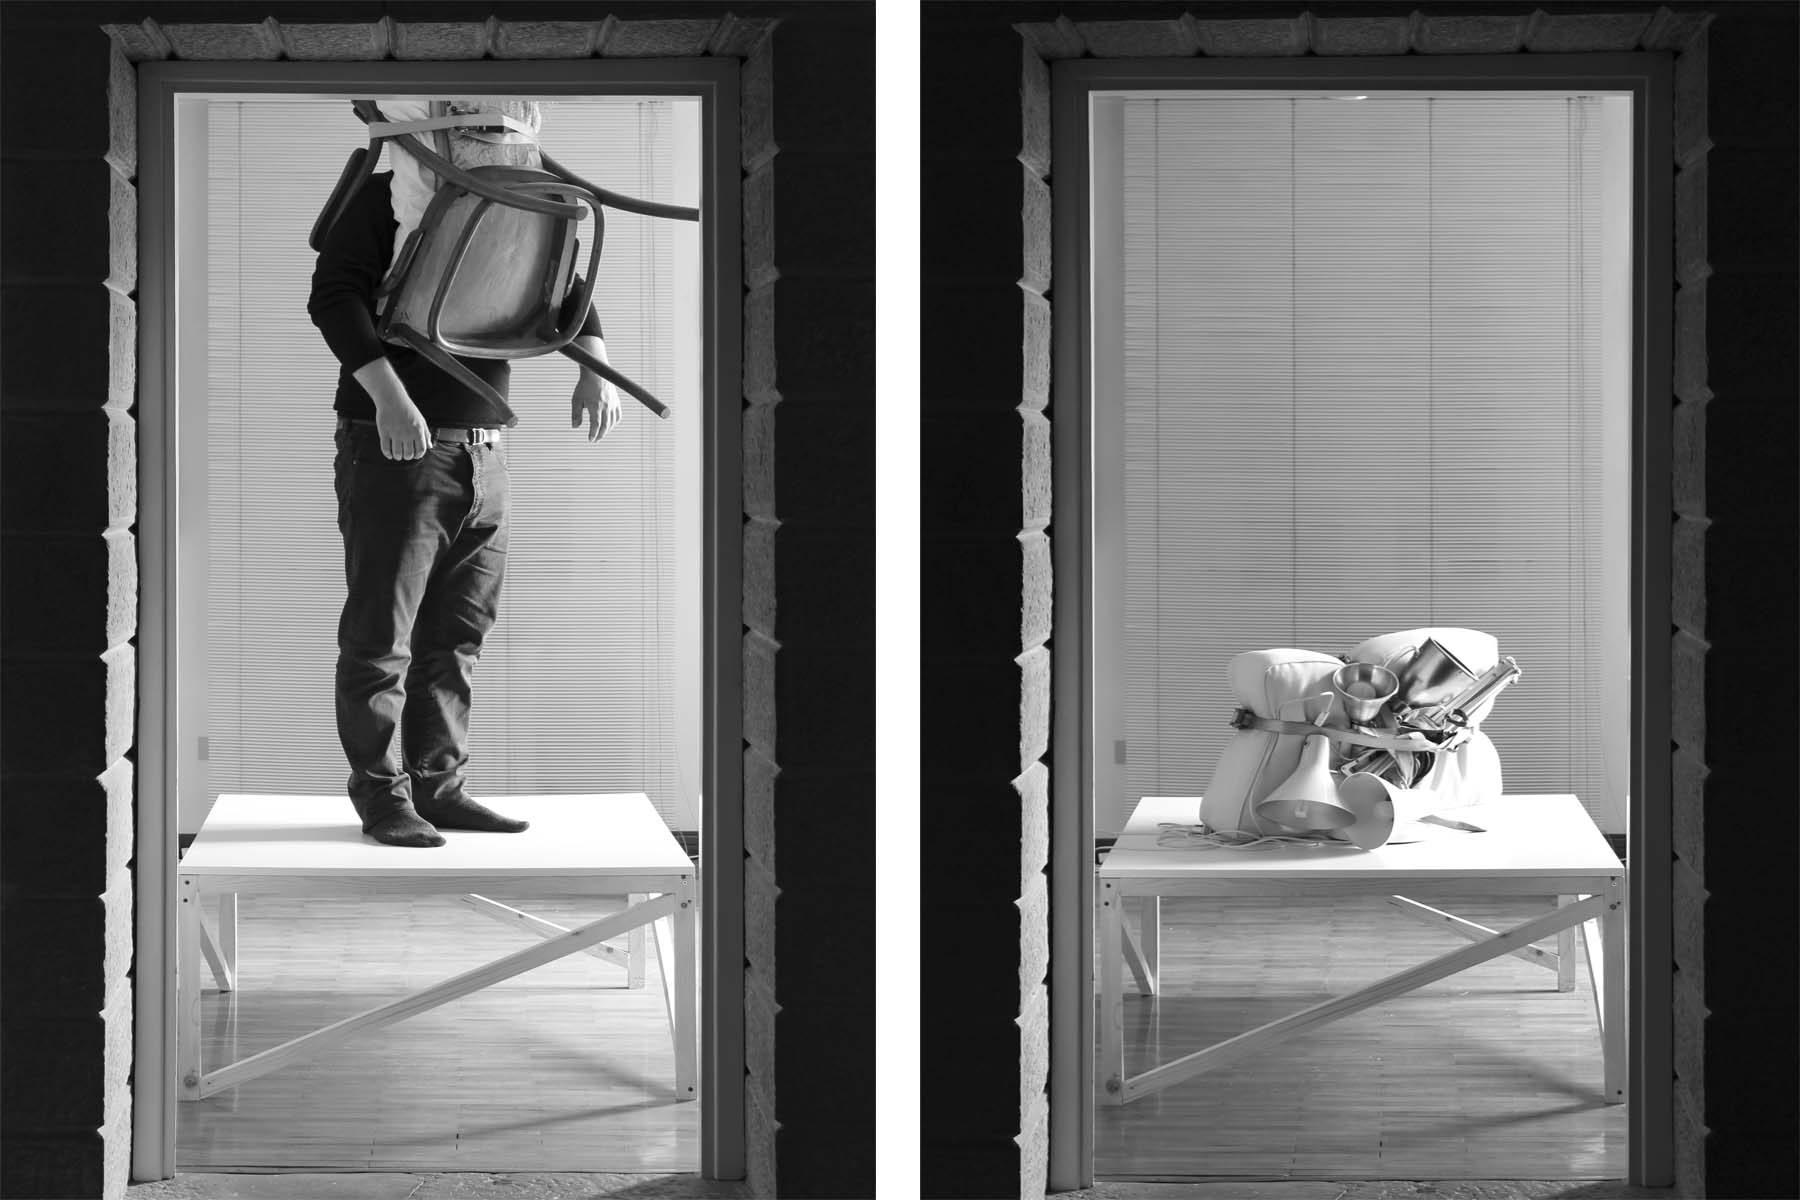 Michele-Tajariol-Nothing-is-hidden-2014-stampa-fineart-su-carta-fotografica-31-x-43-cm-ciascuno